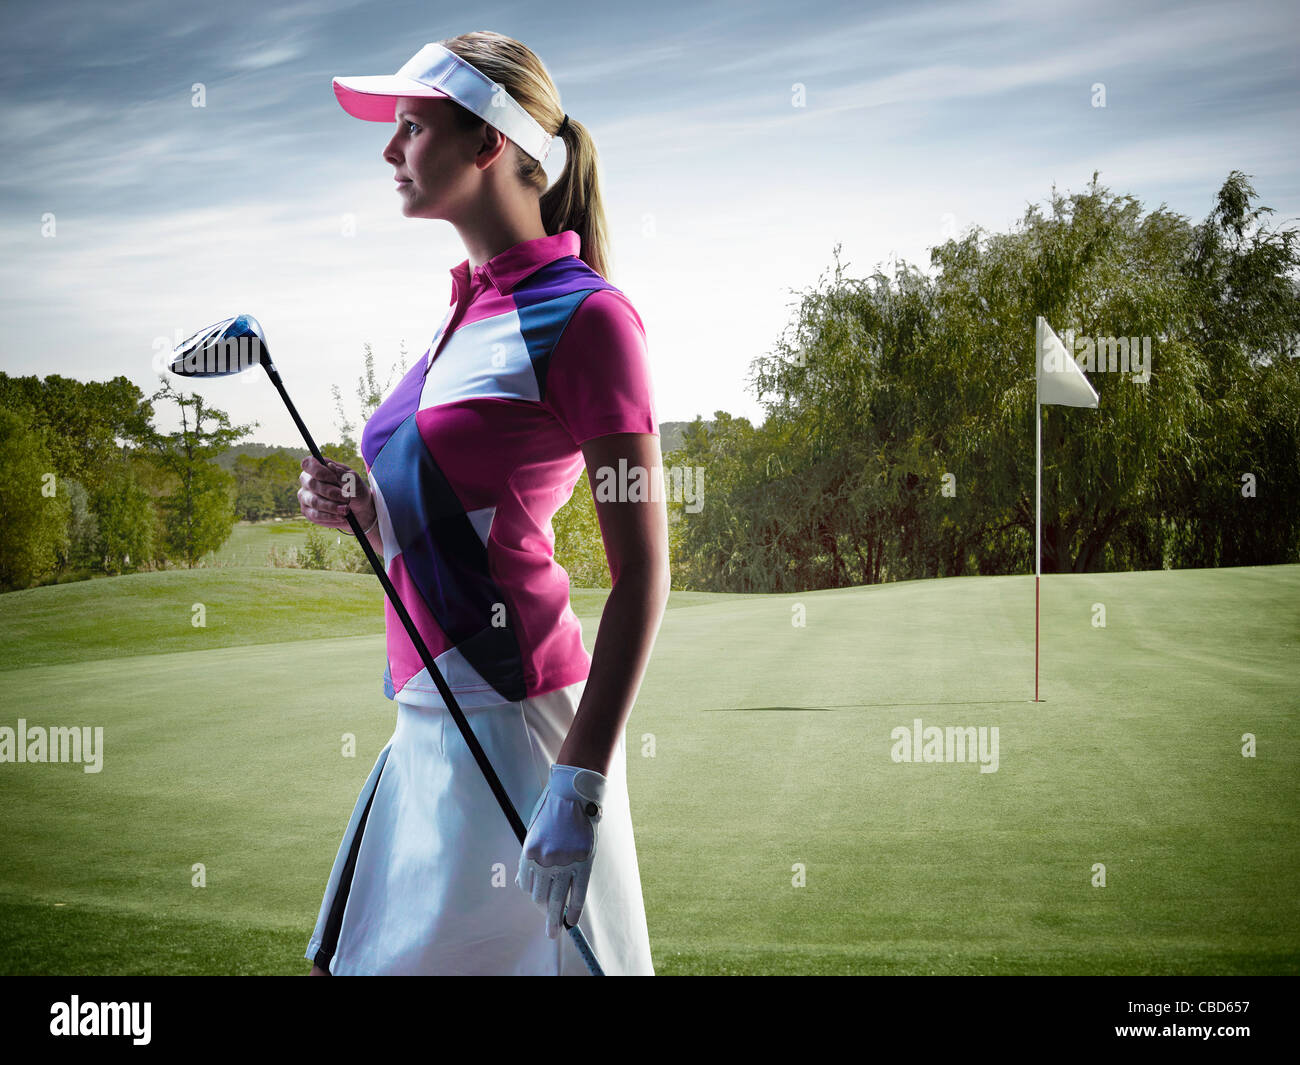 Frau mit Golfclub auf Kurs Stockbild